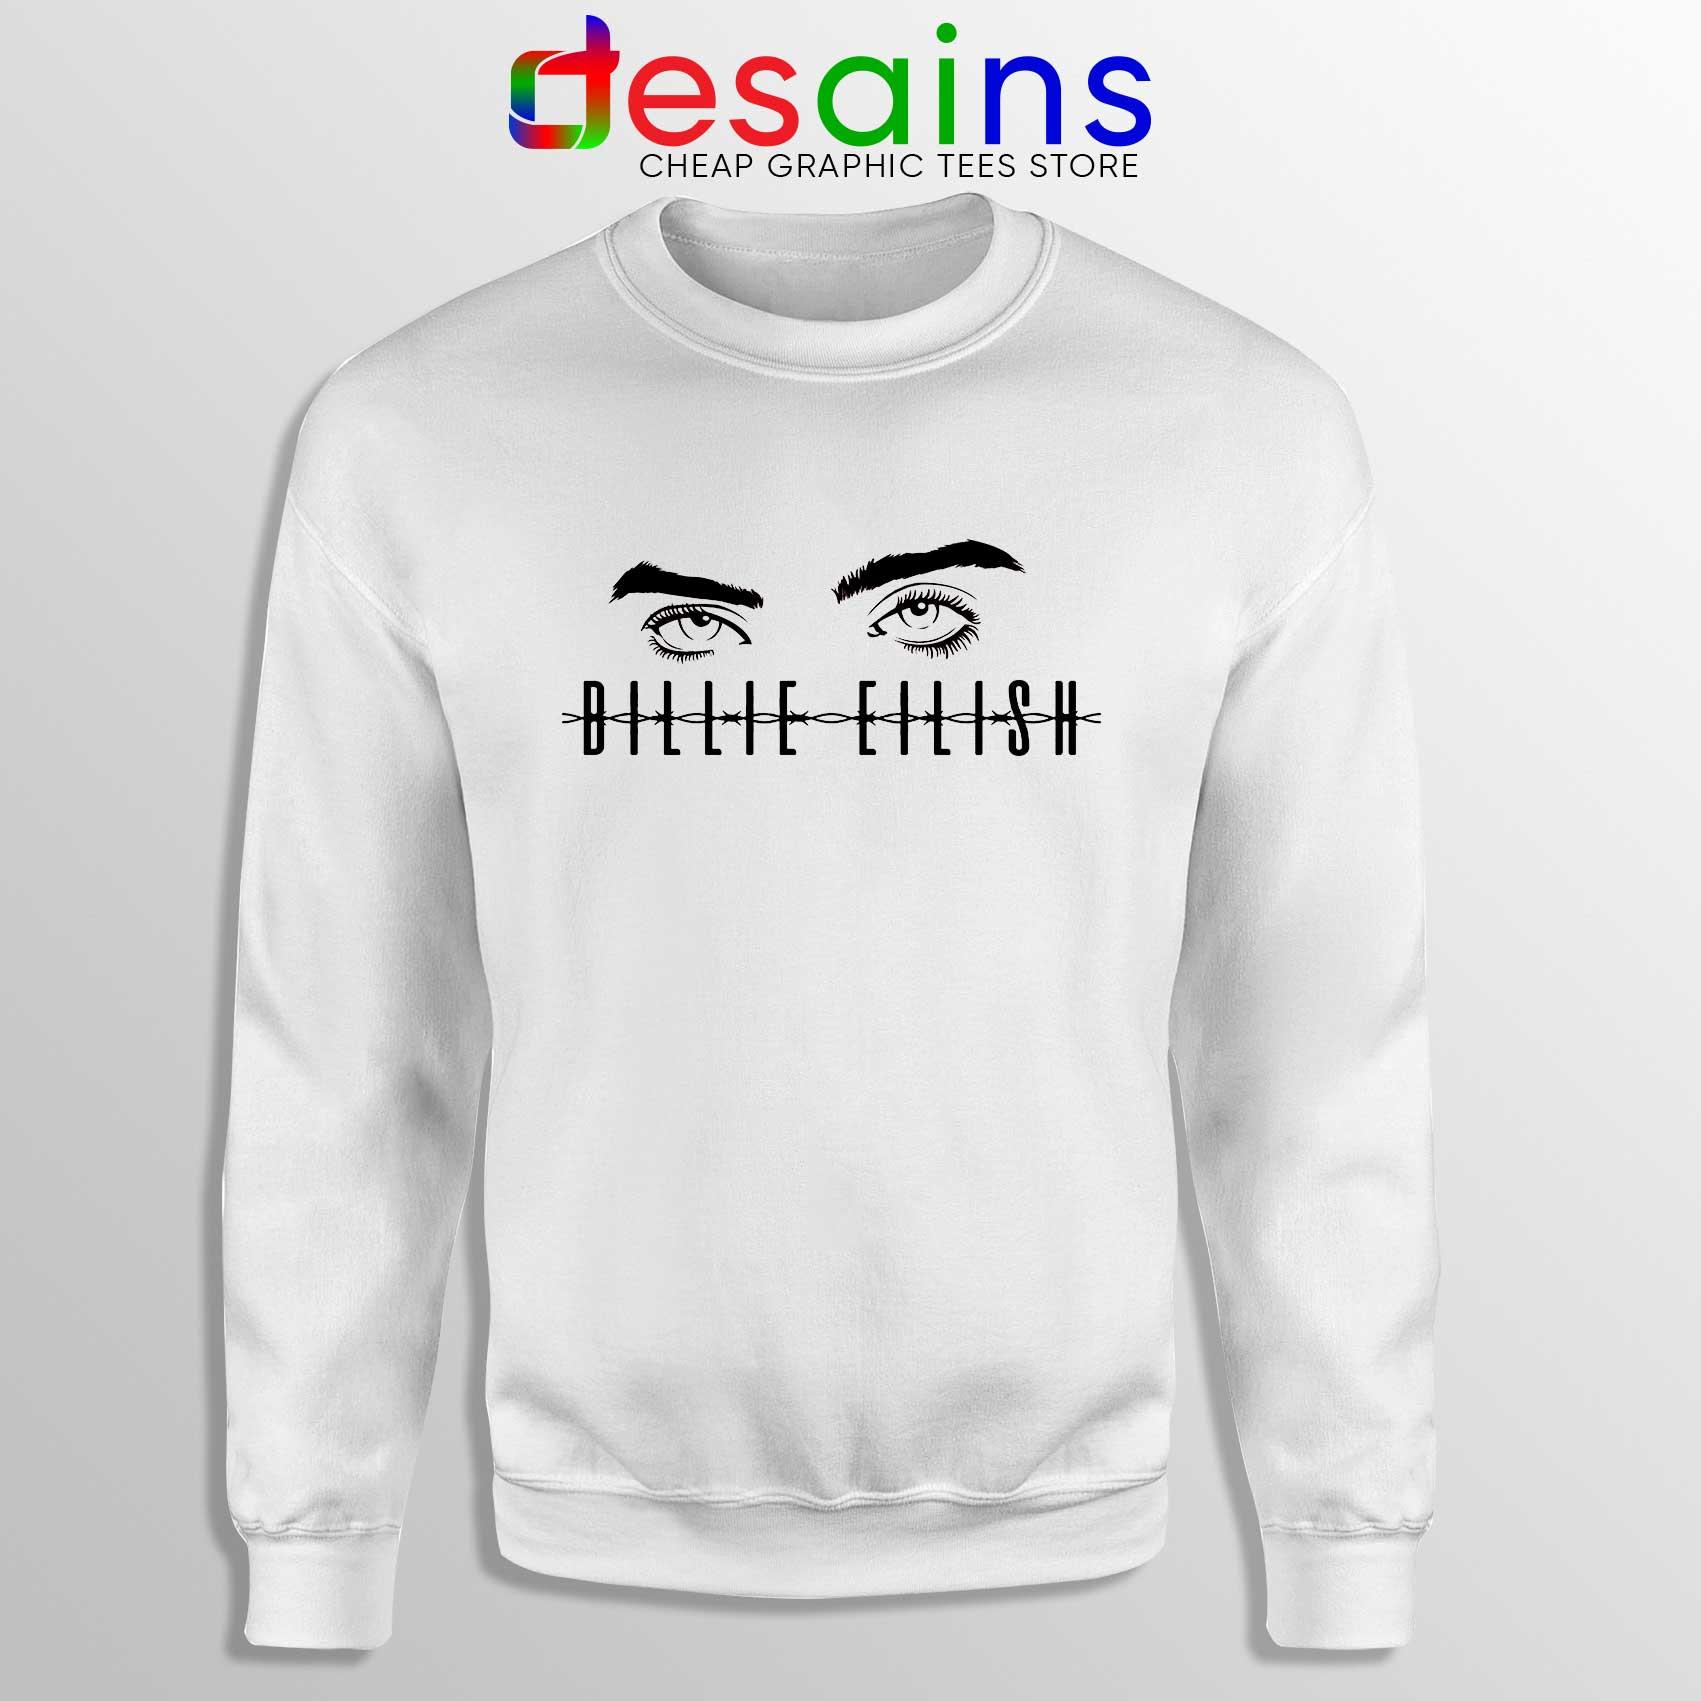 550604b47 Cheap-Sweatshirt-Billie-Eilish-Ocean-Eyes-Crewneck-Size-S-3XL.jpg